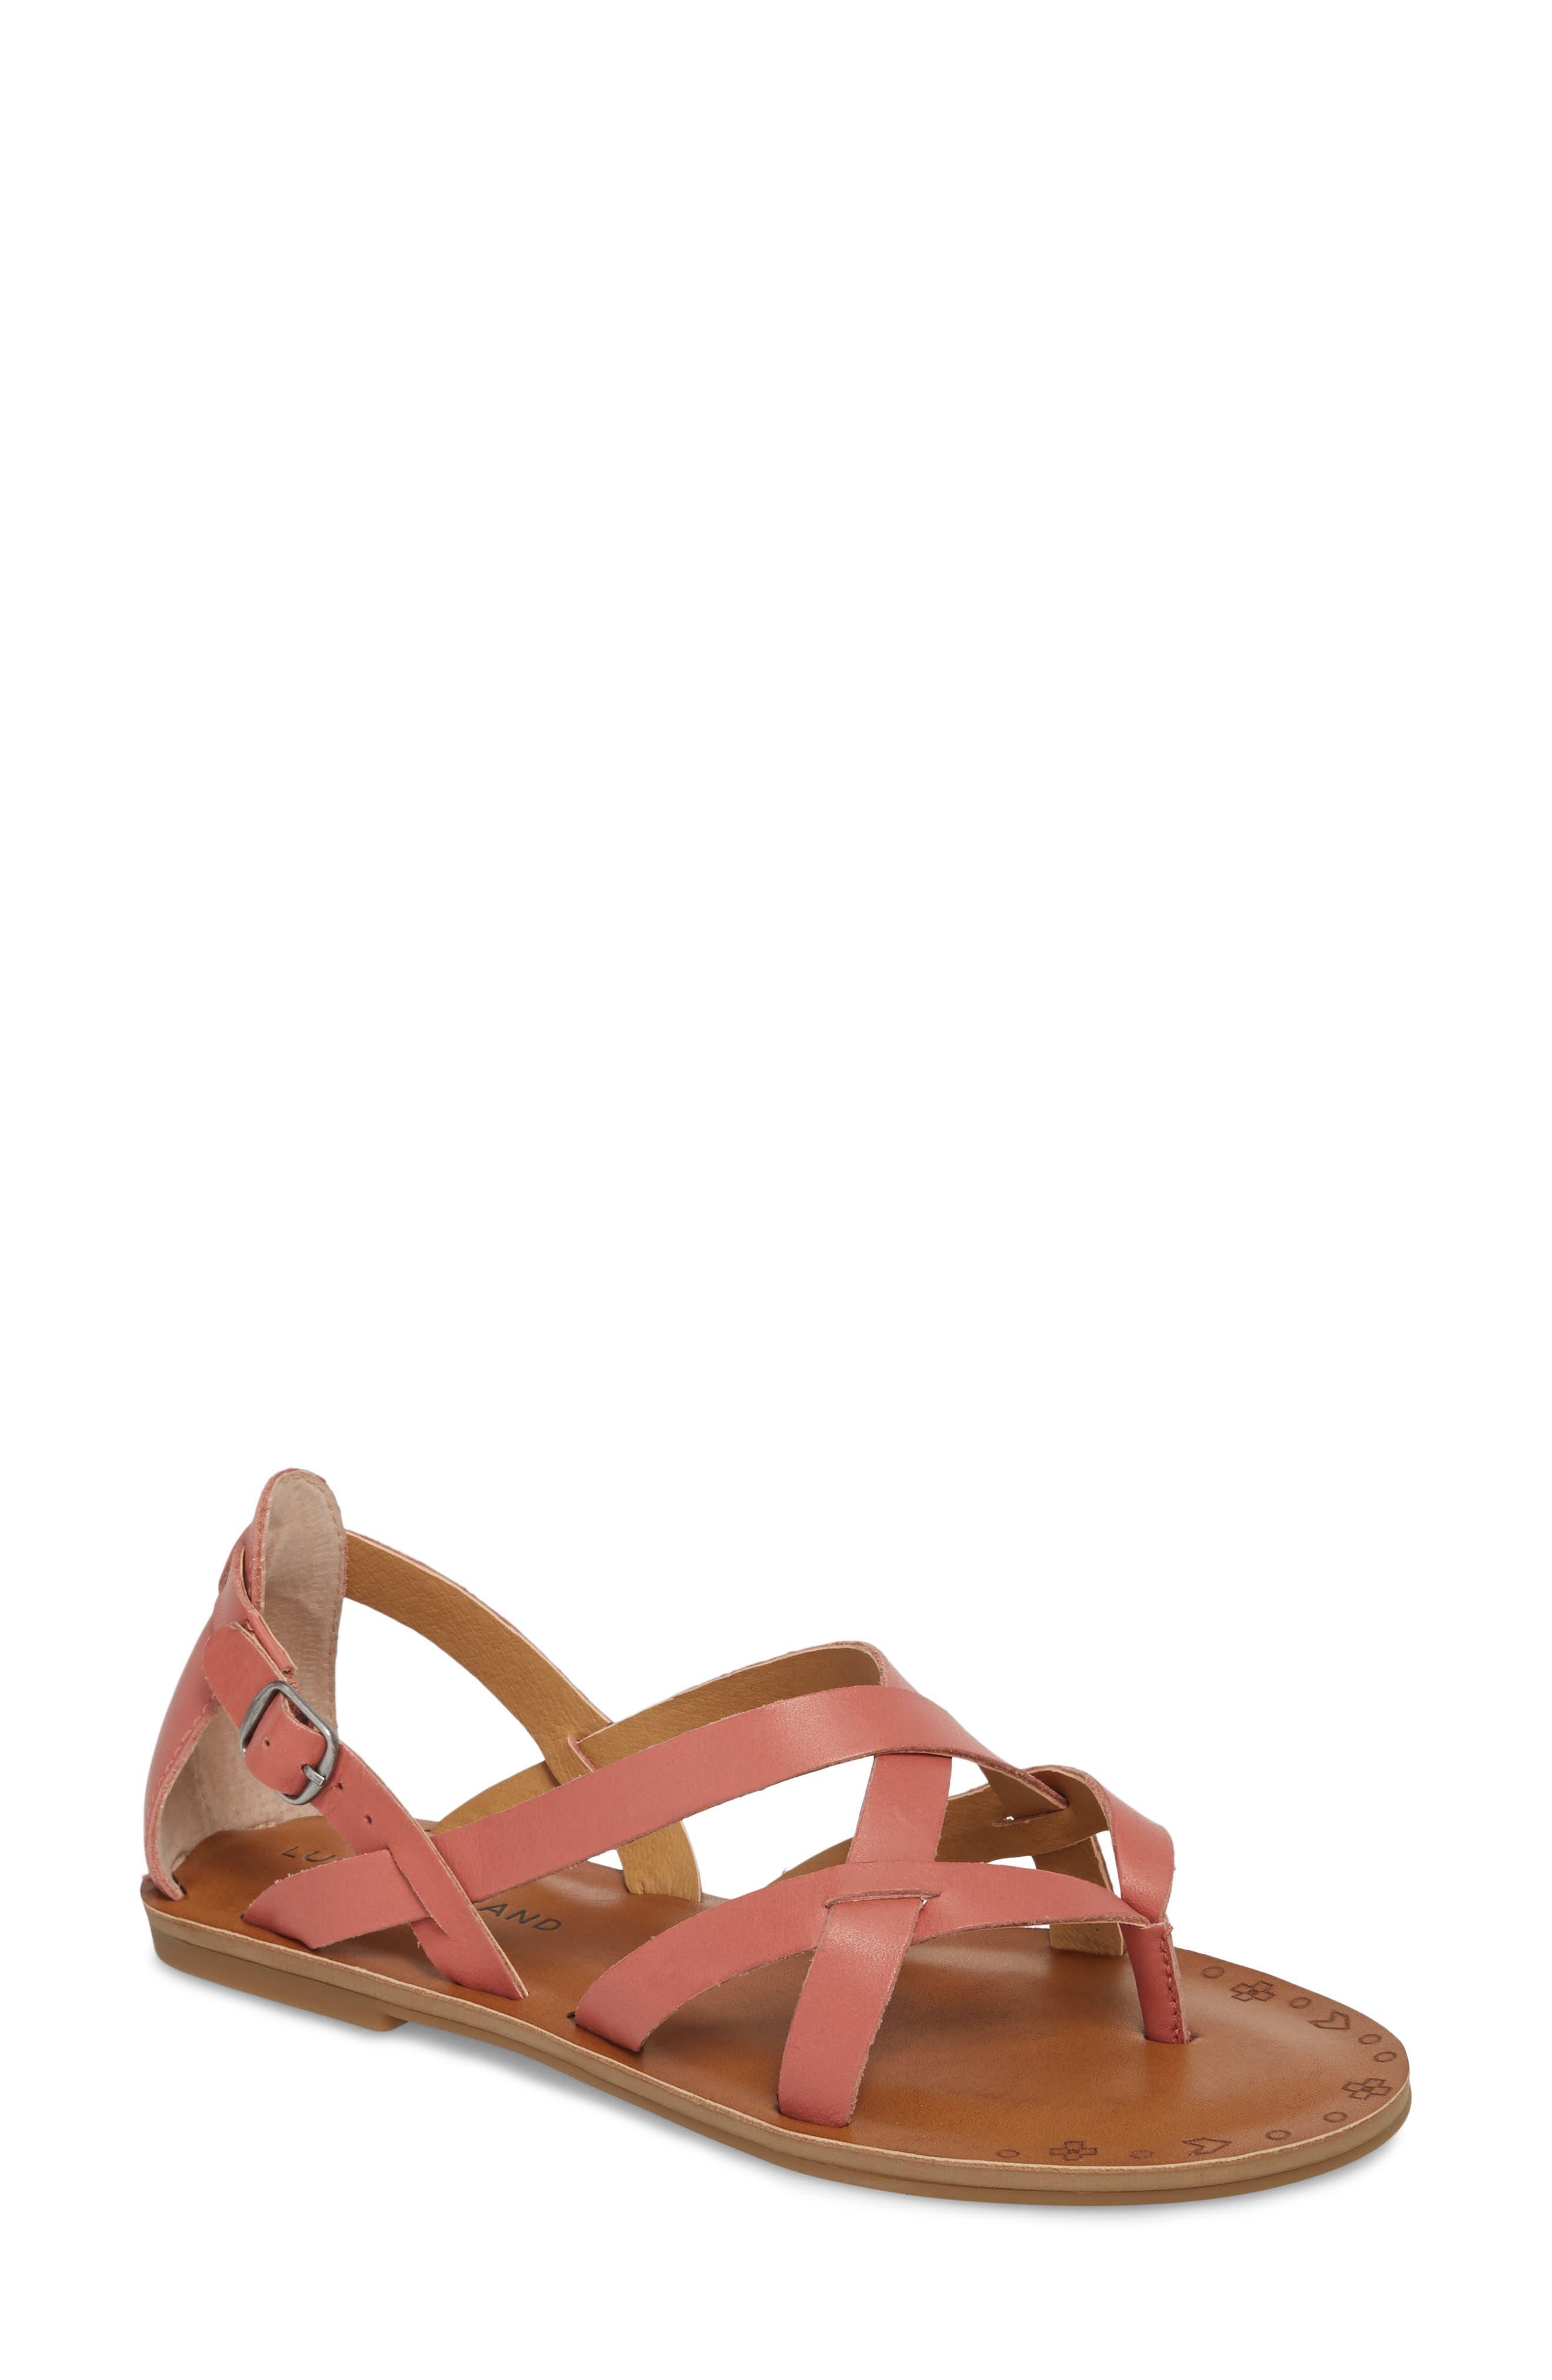 Ainsley Flat Sandal,                             Main thumbnail 1, color,                             Canyon Rose Leather